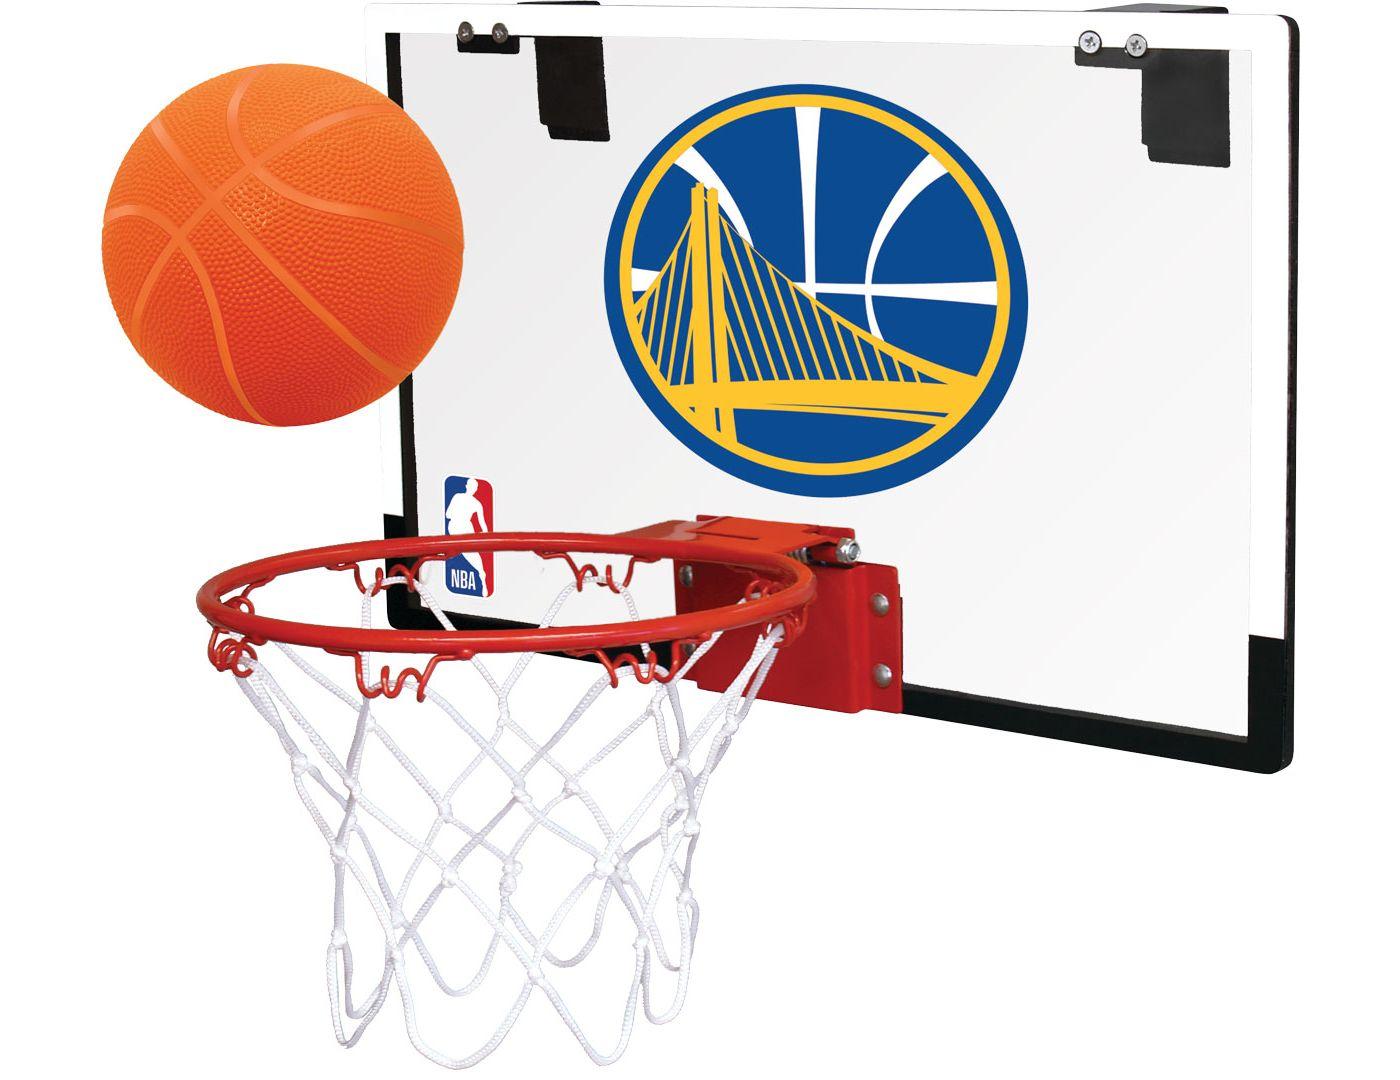 Rawlings Golden State Warriors Polycarbonate Hoop Set